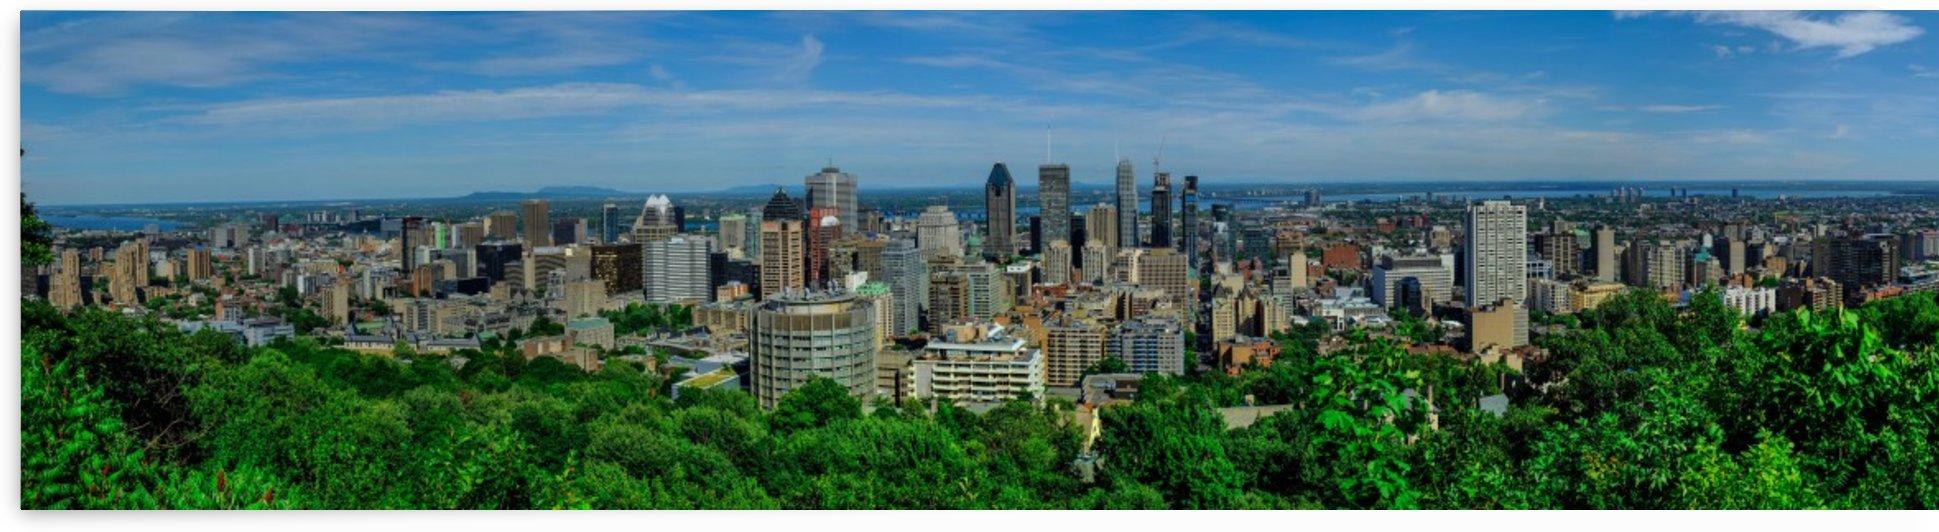 montreal panorama by Ara Samson